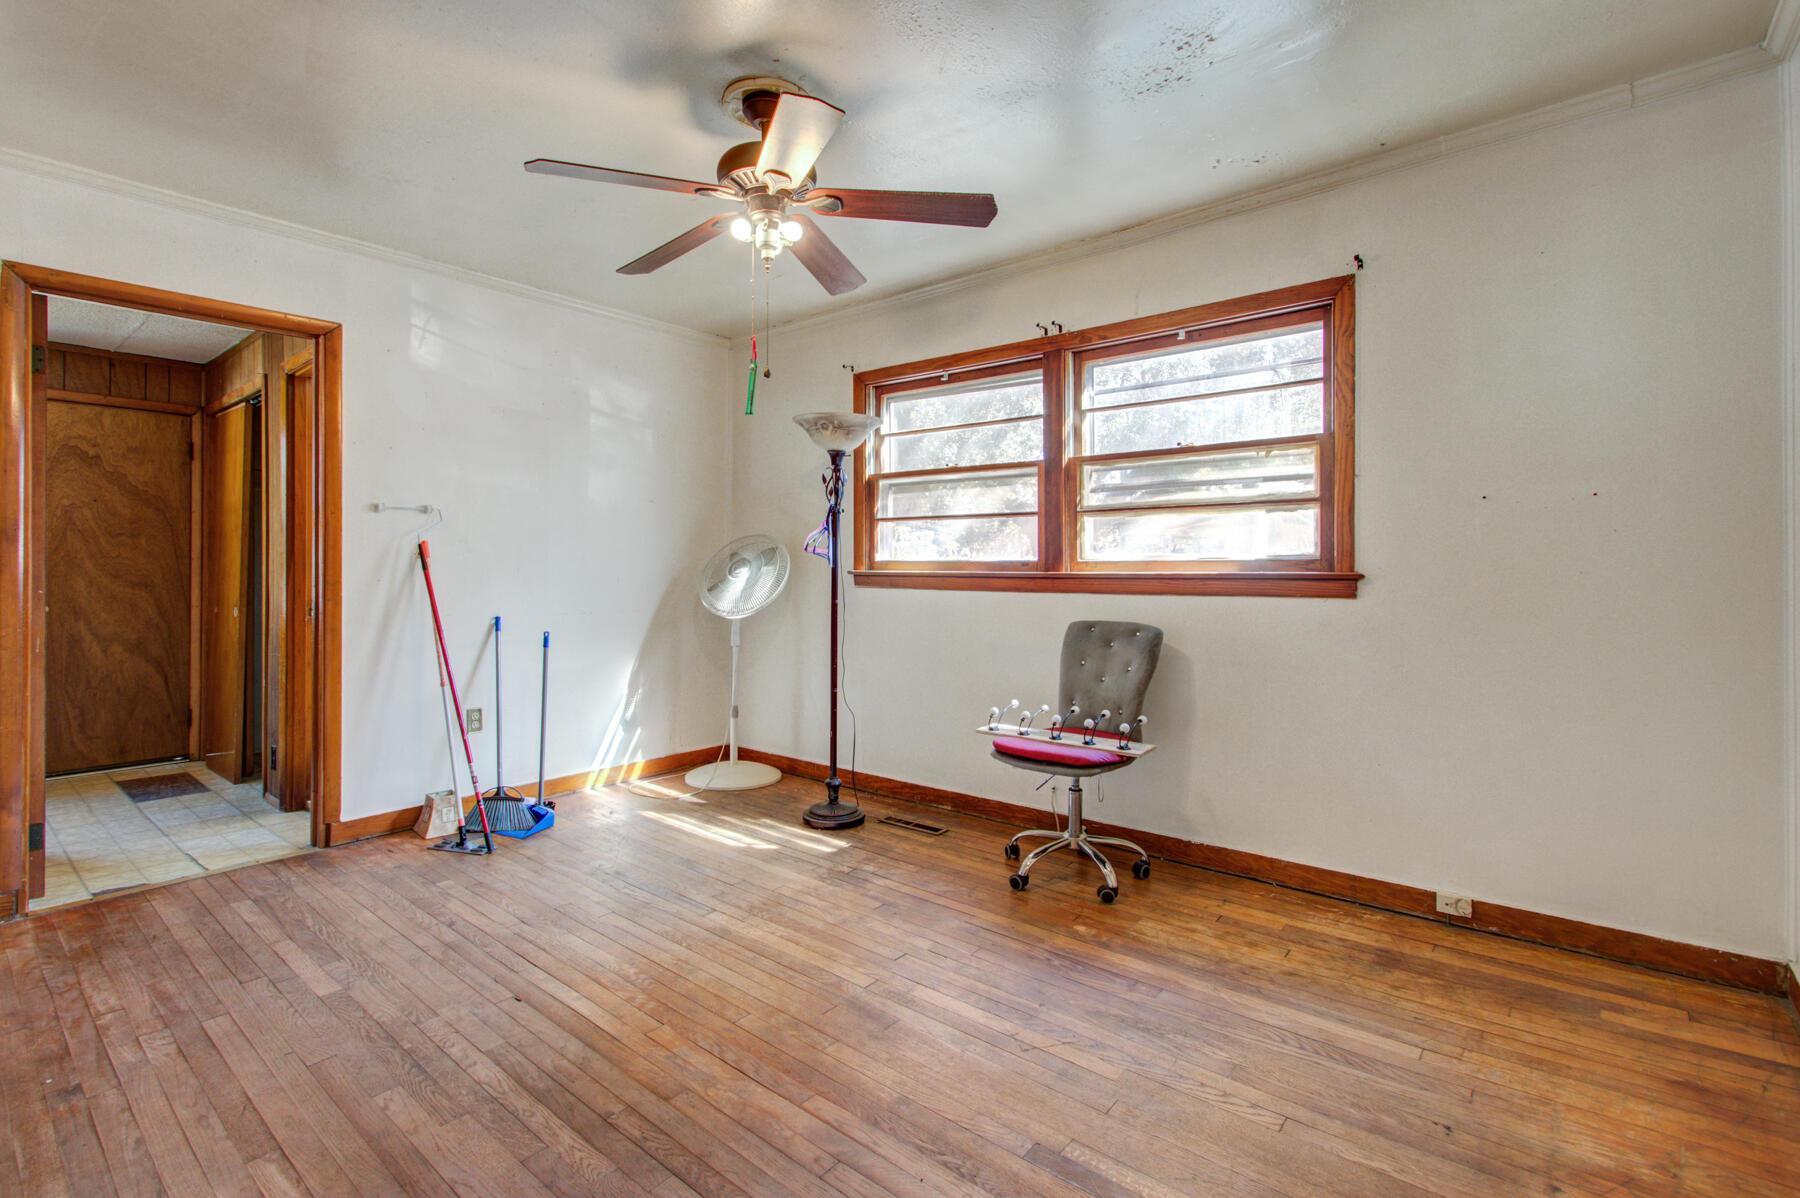 Port Park Homes For Sale - 5814 Moore, Hanahan, SC - 12